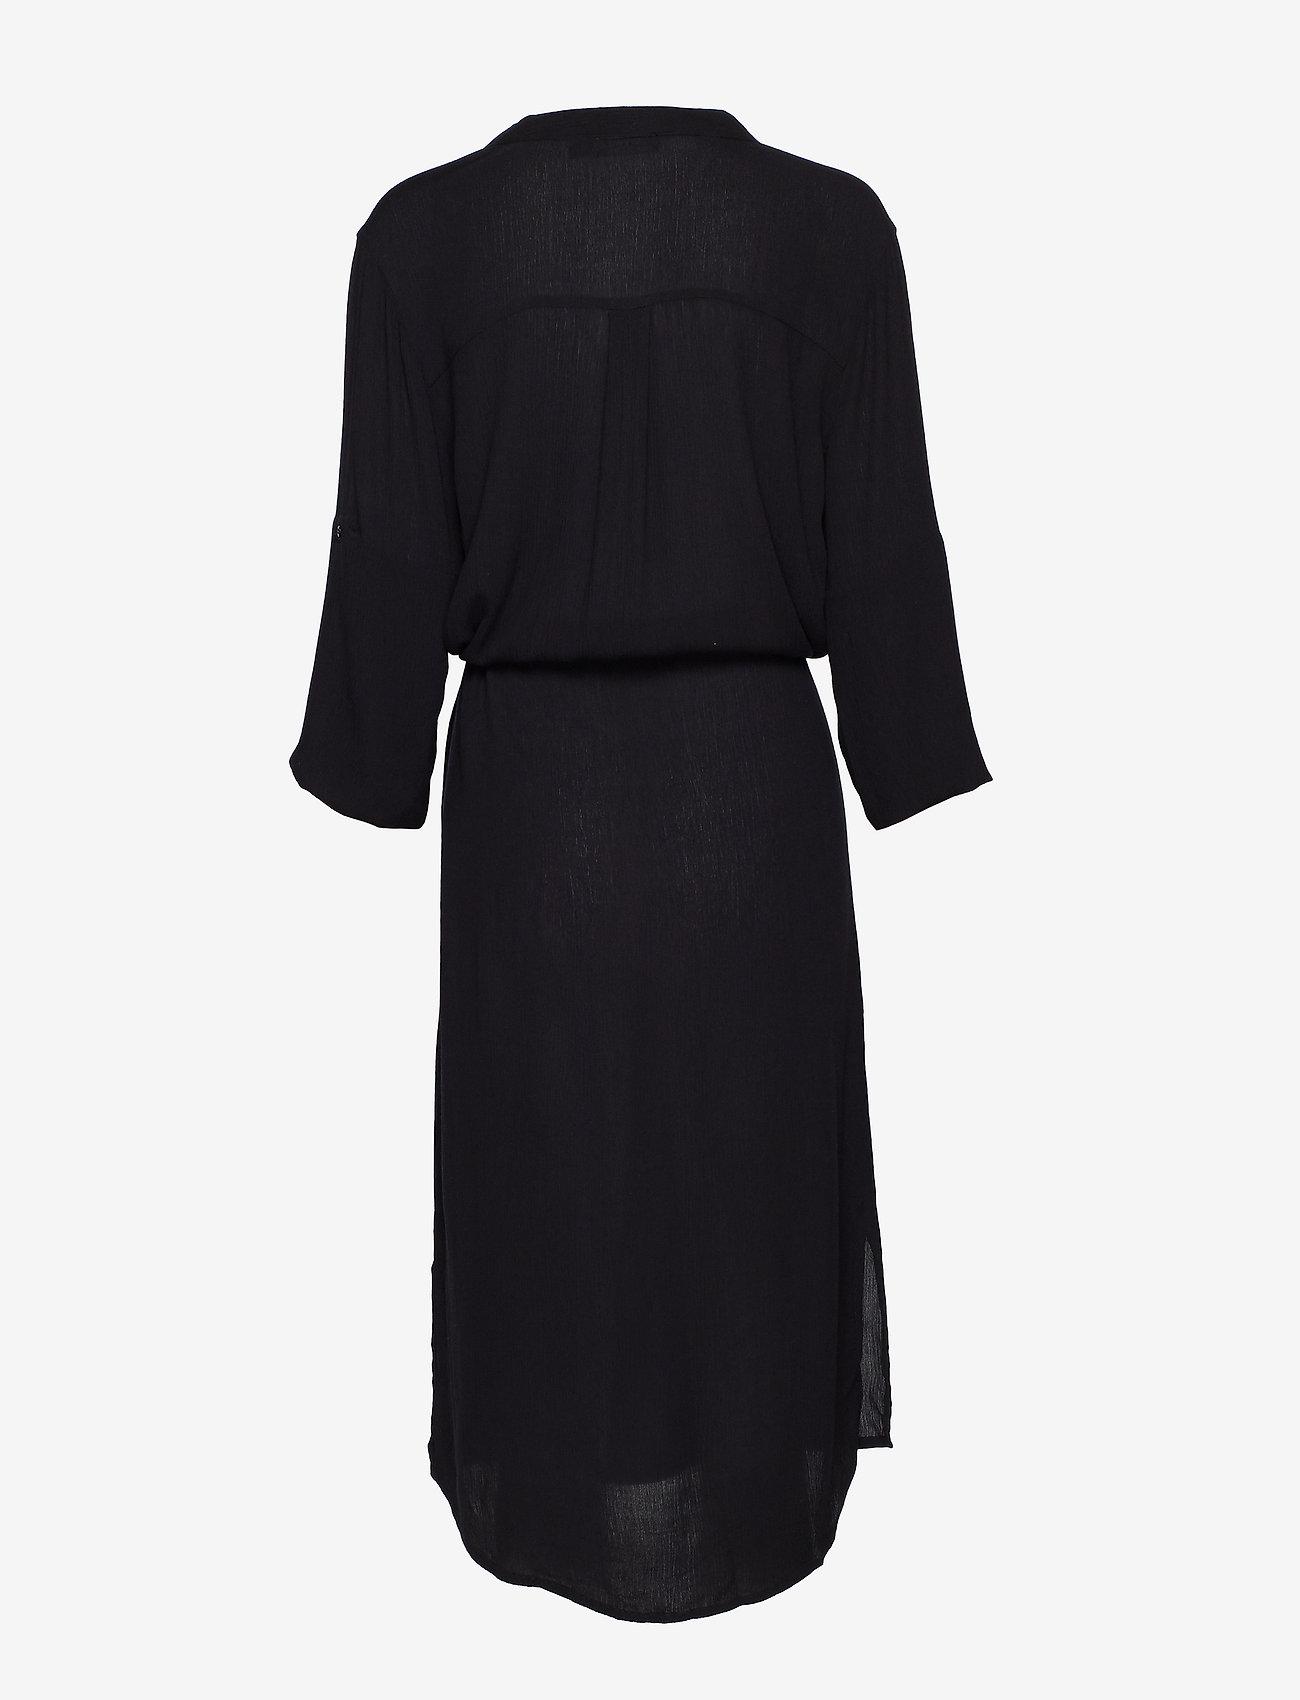 Sl Zaya Dress (Black) (59.50 €) - Soaked in Luxury 1G65ZwDc